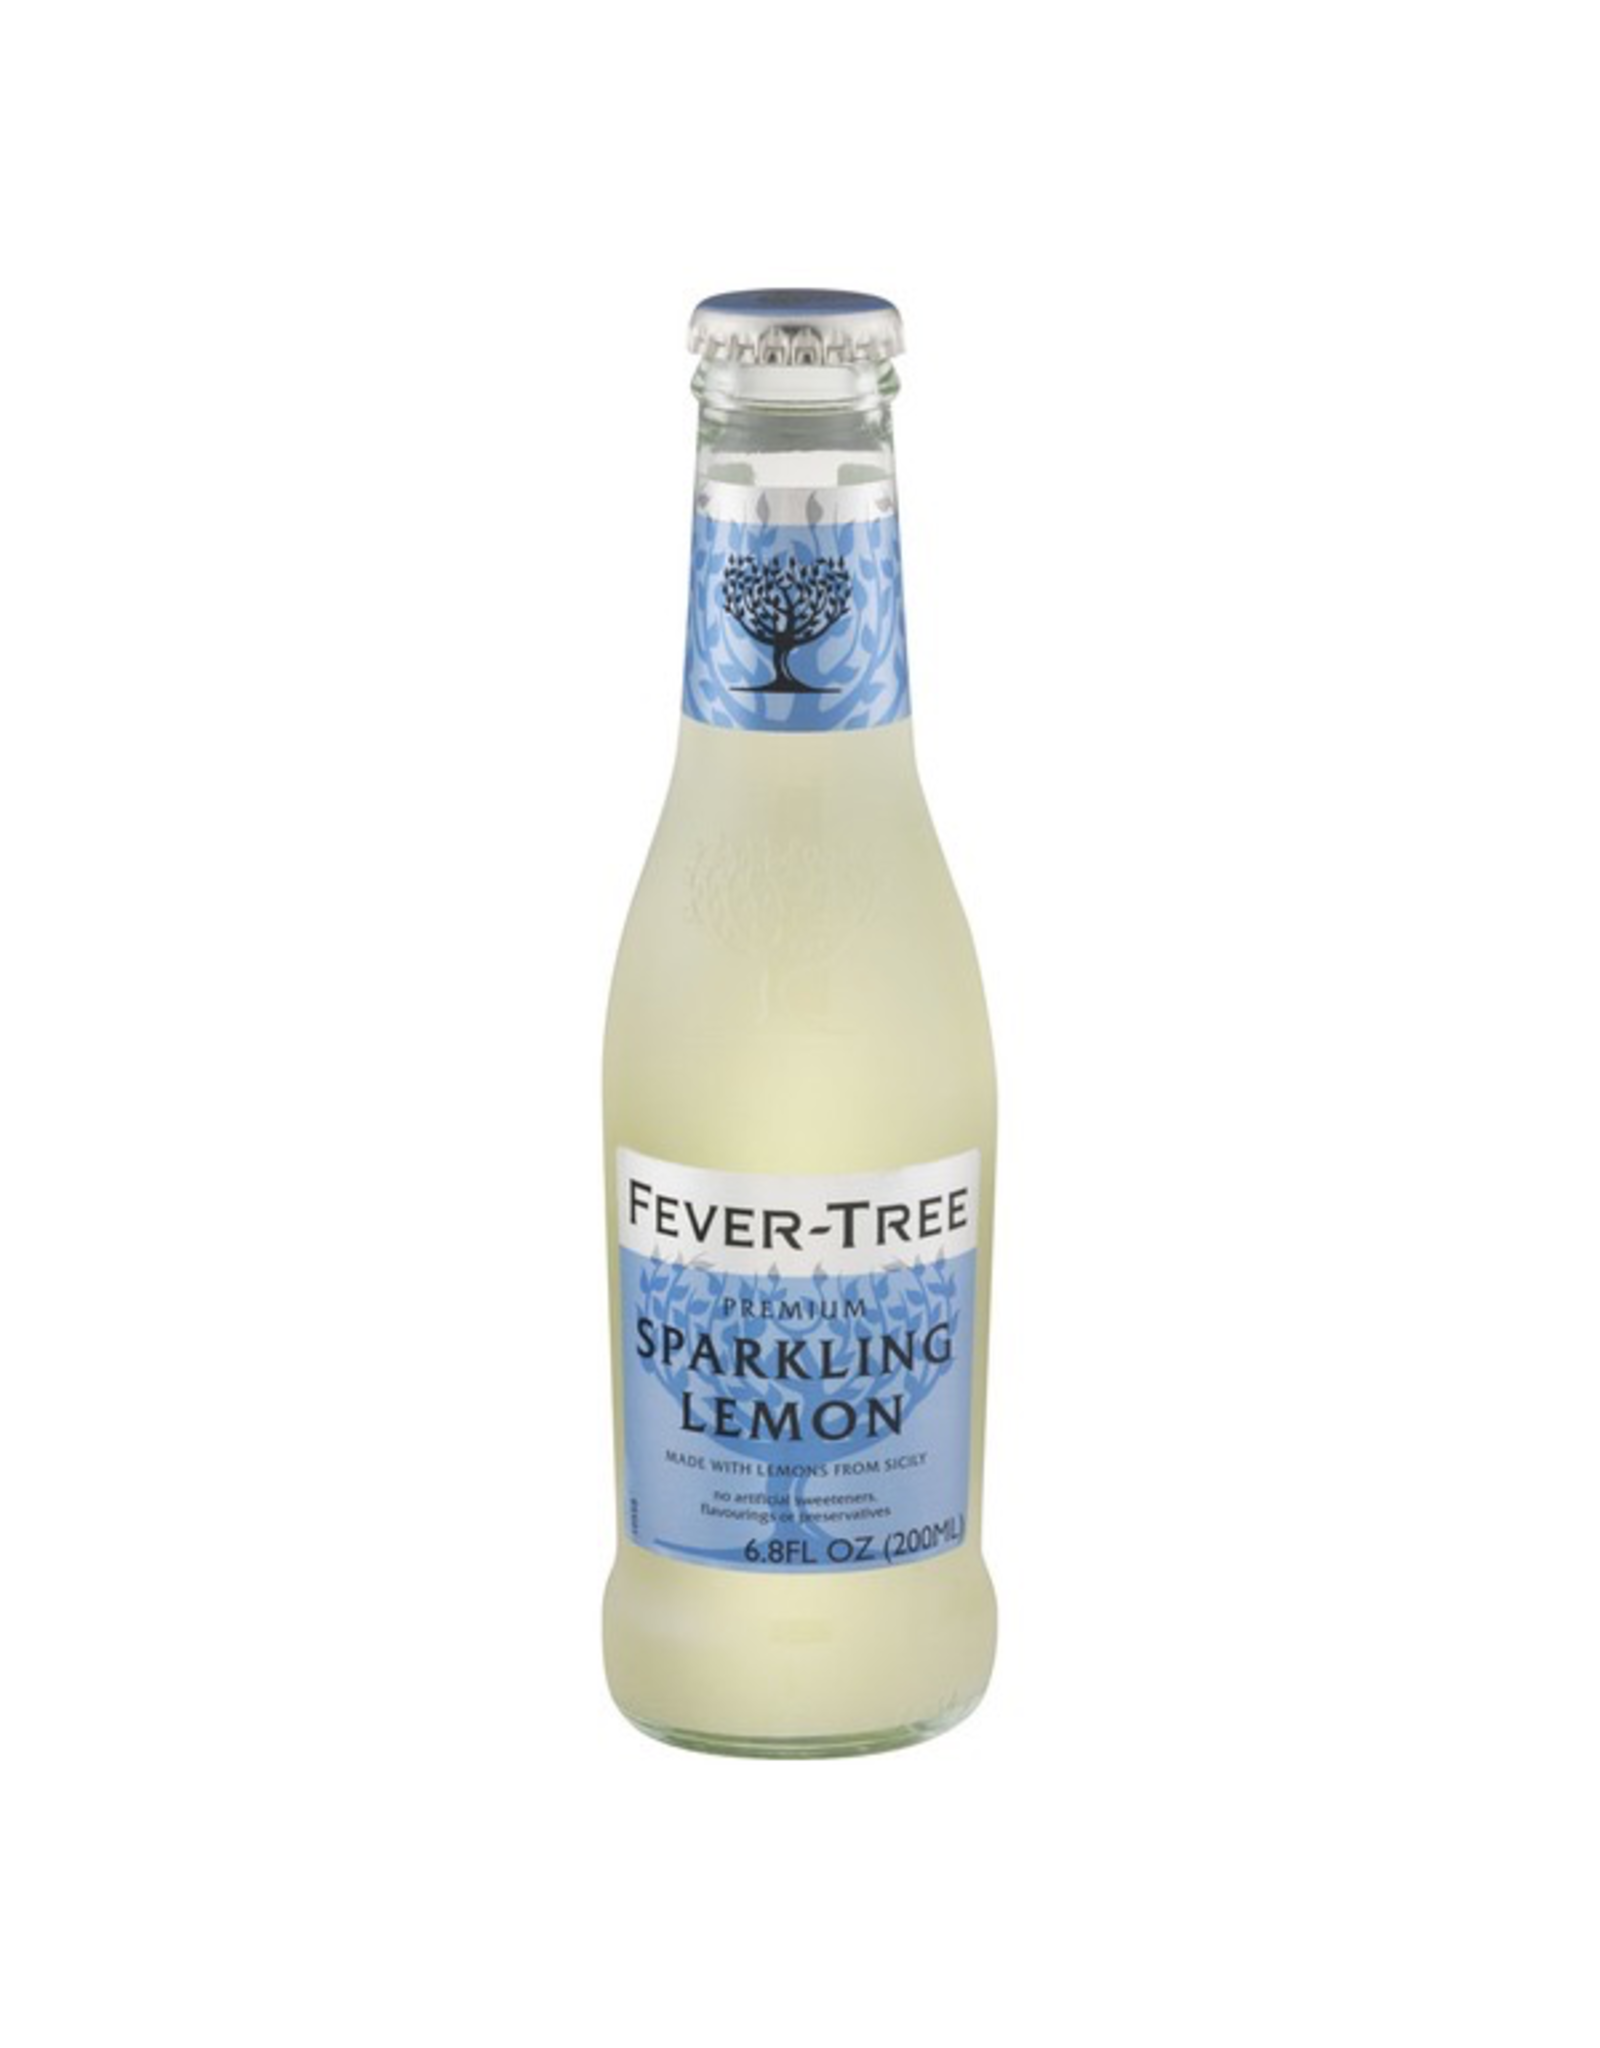 Specialty Drink Fever-Tree, Sparkling Lemon, 6.8 Fl Oz (200ml)